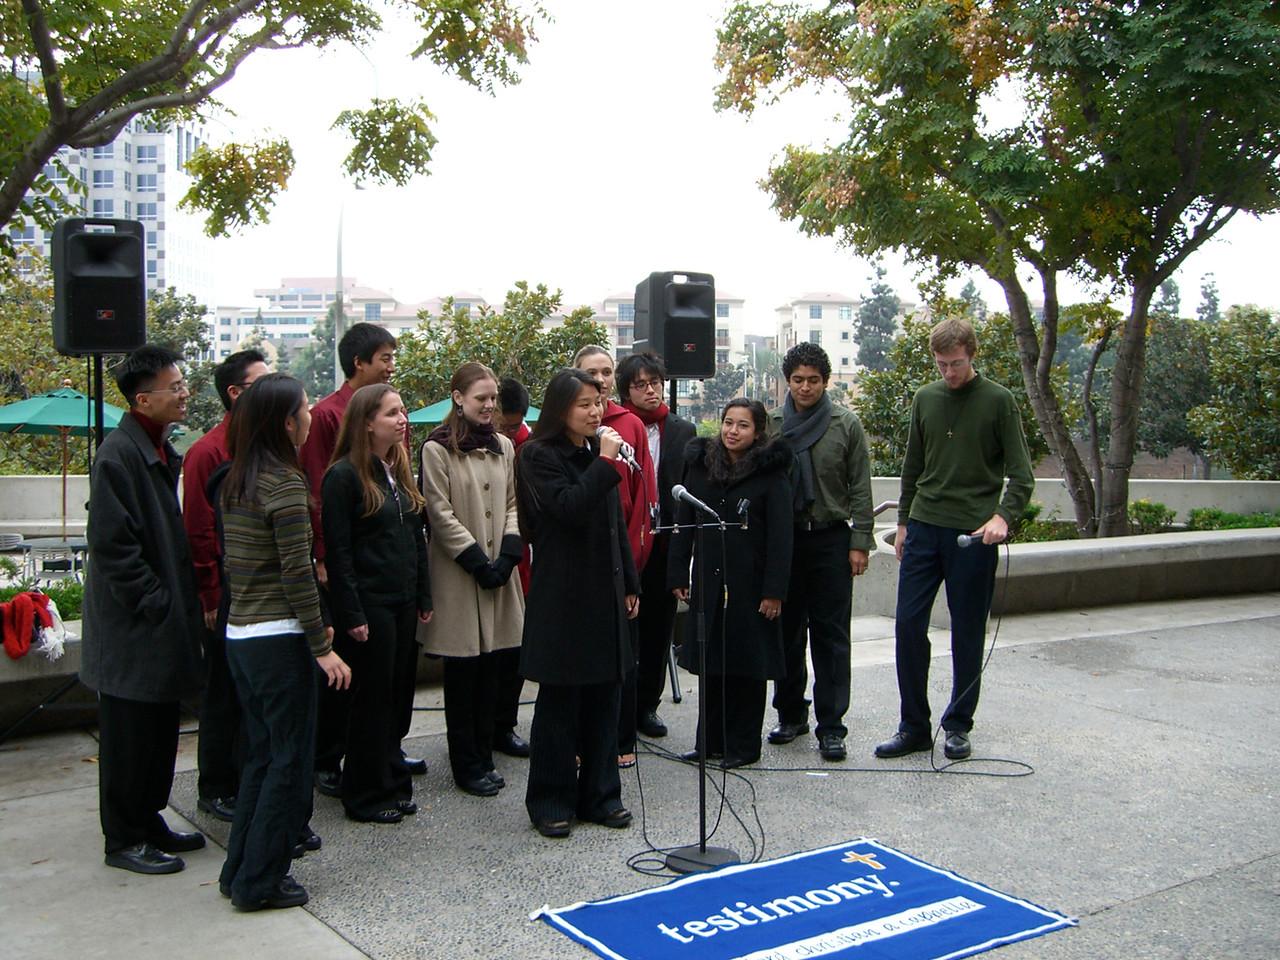 2005 12 18 Sun - Lake Ave Church - Jenn Kim intros Less Is More